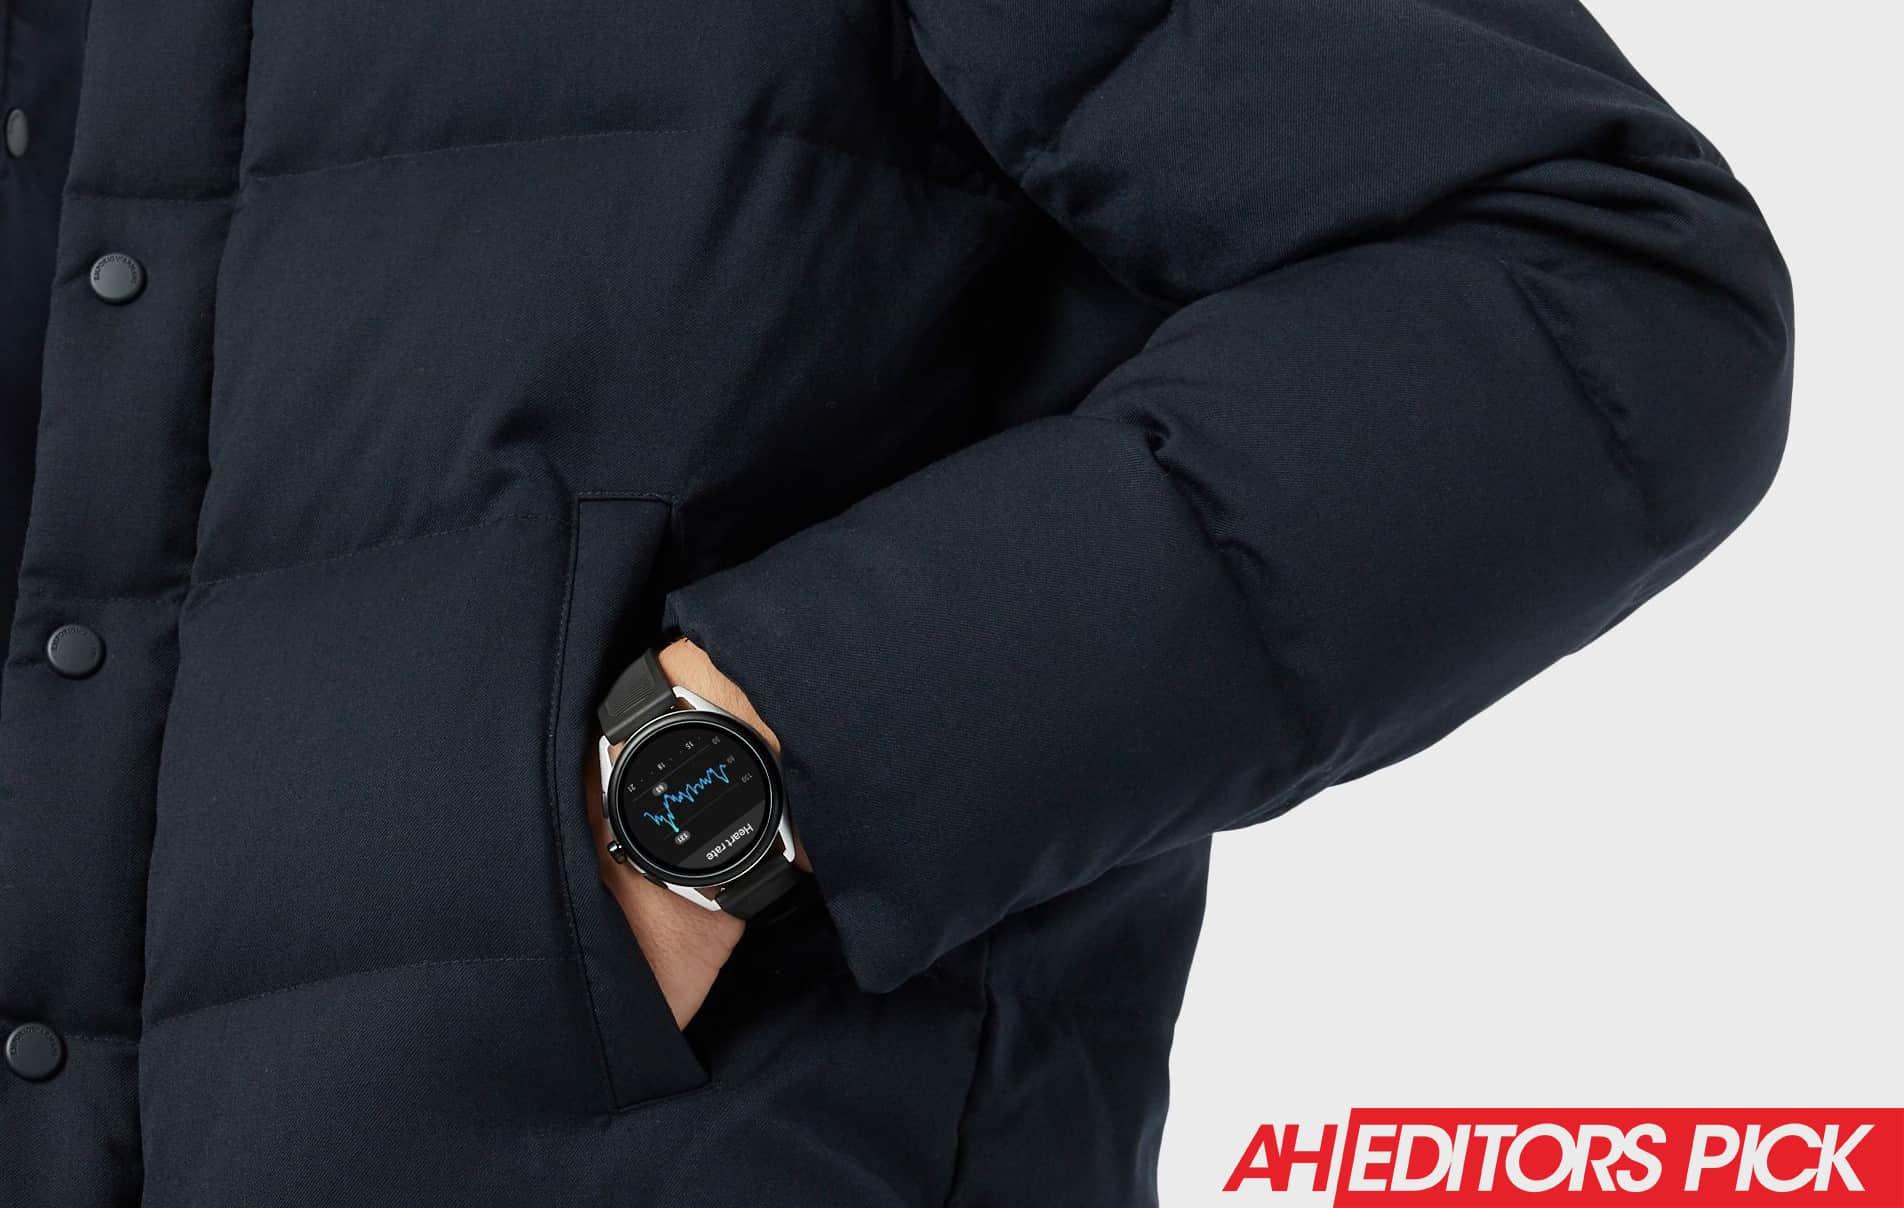 Emporio Armani Smartwatch 3 Editors Pick